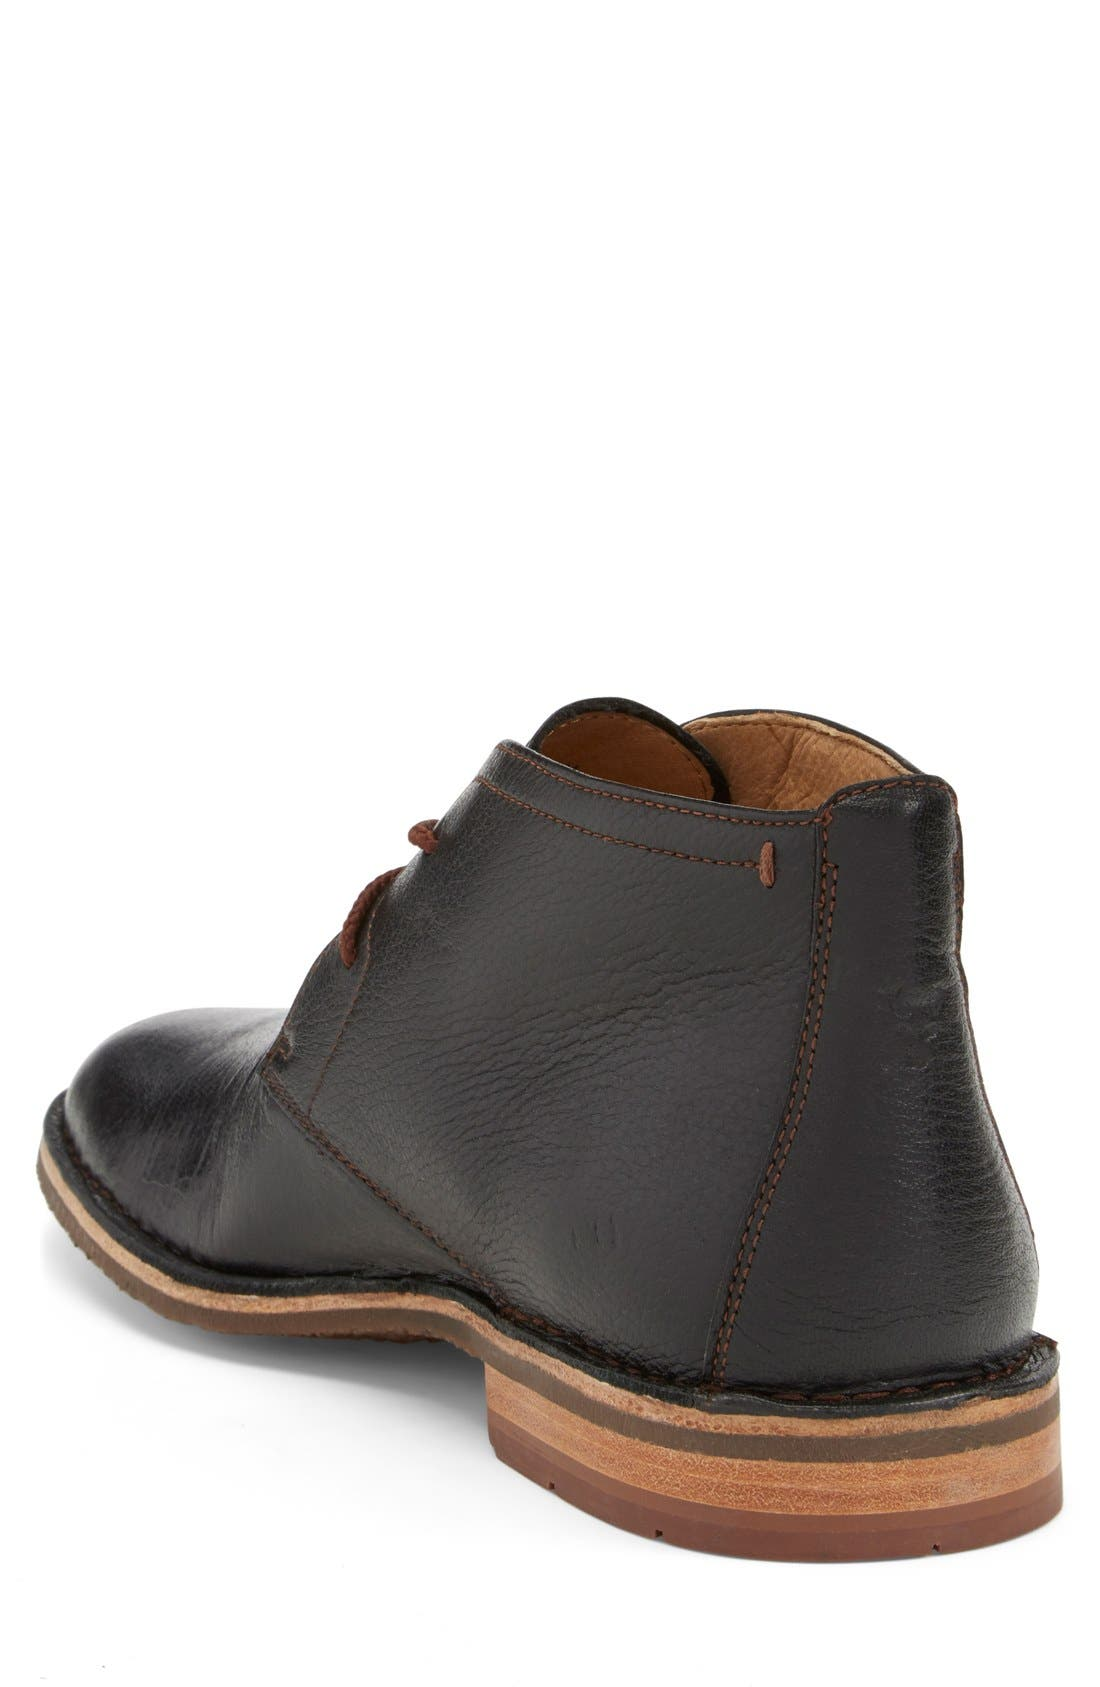 'Brady' Chukka Boot,                             Alternate thumbnail 2, color,                             BLACK NORWEGIAN ELK